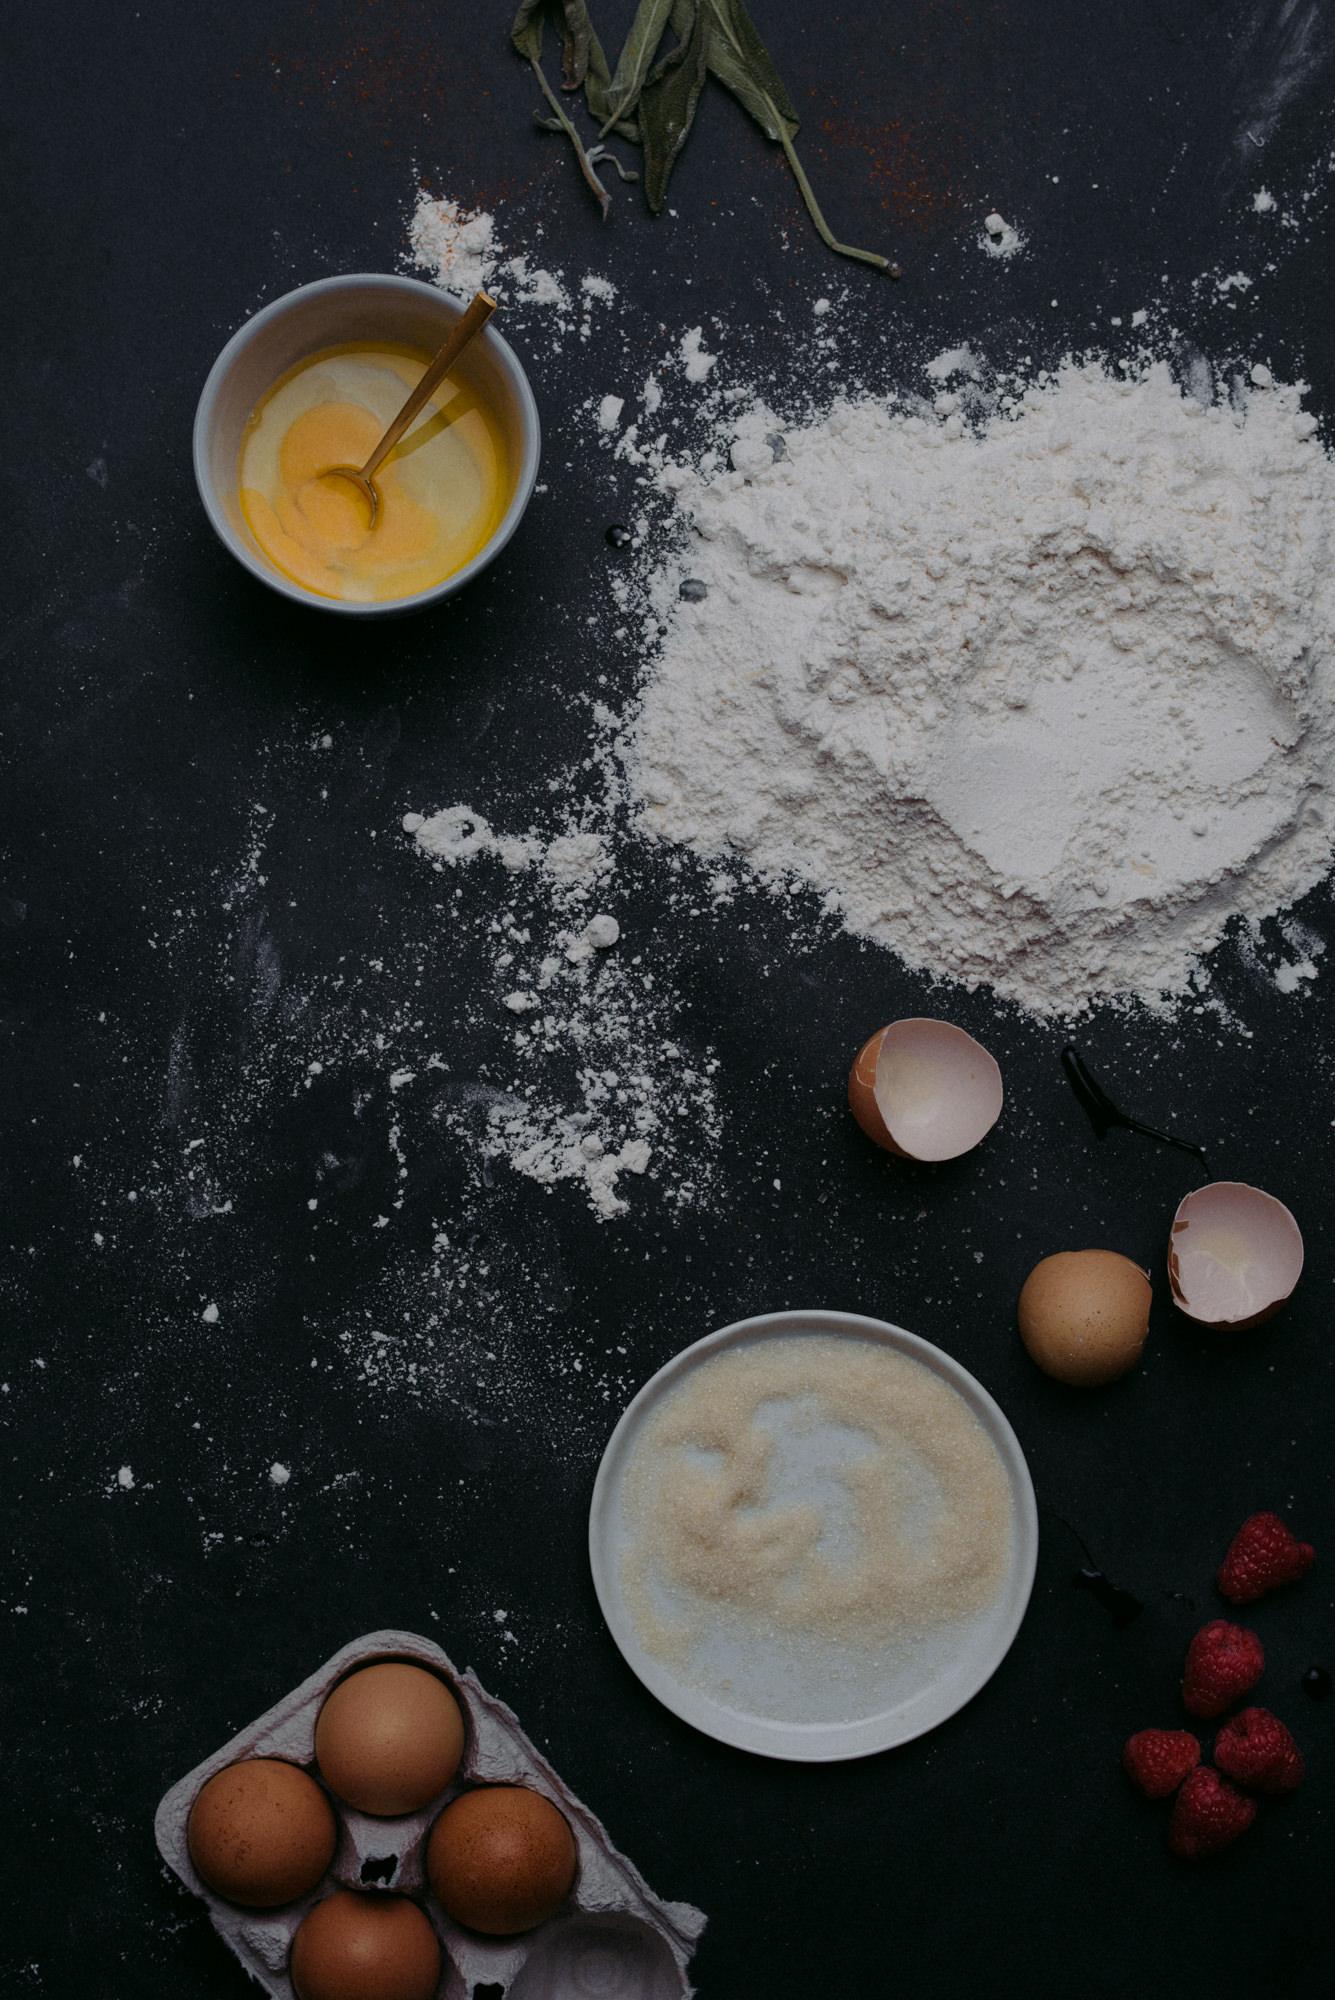 nashville-editorial-food-photographer-31.jpg